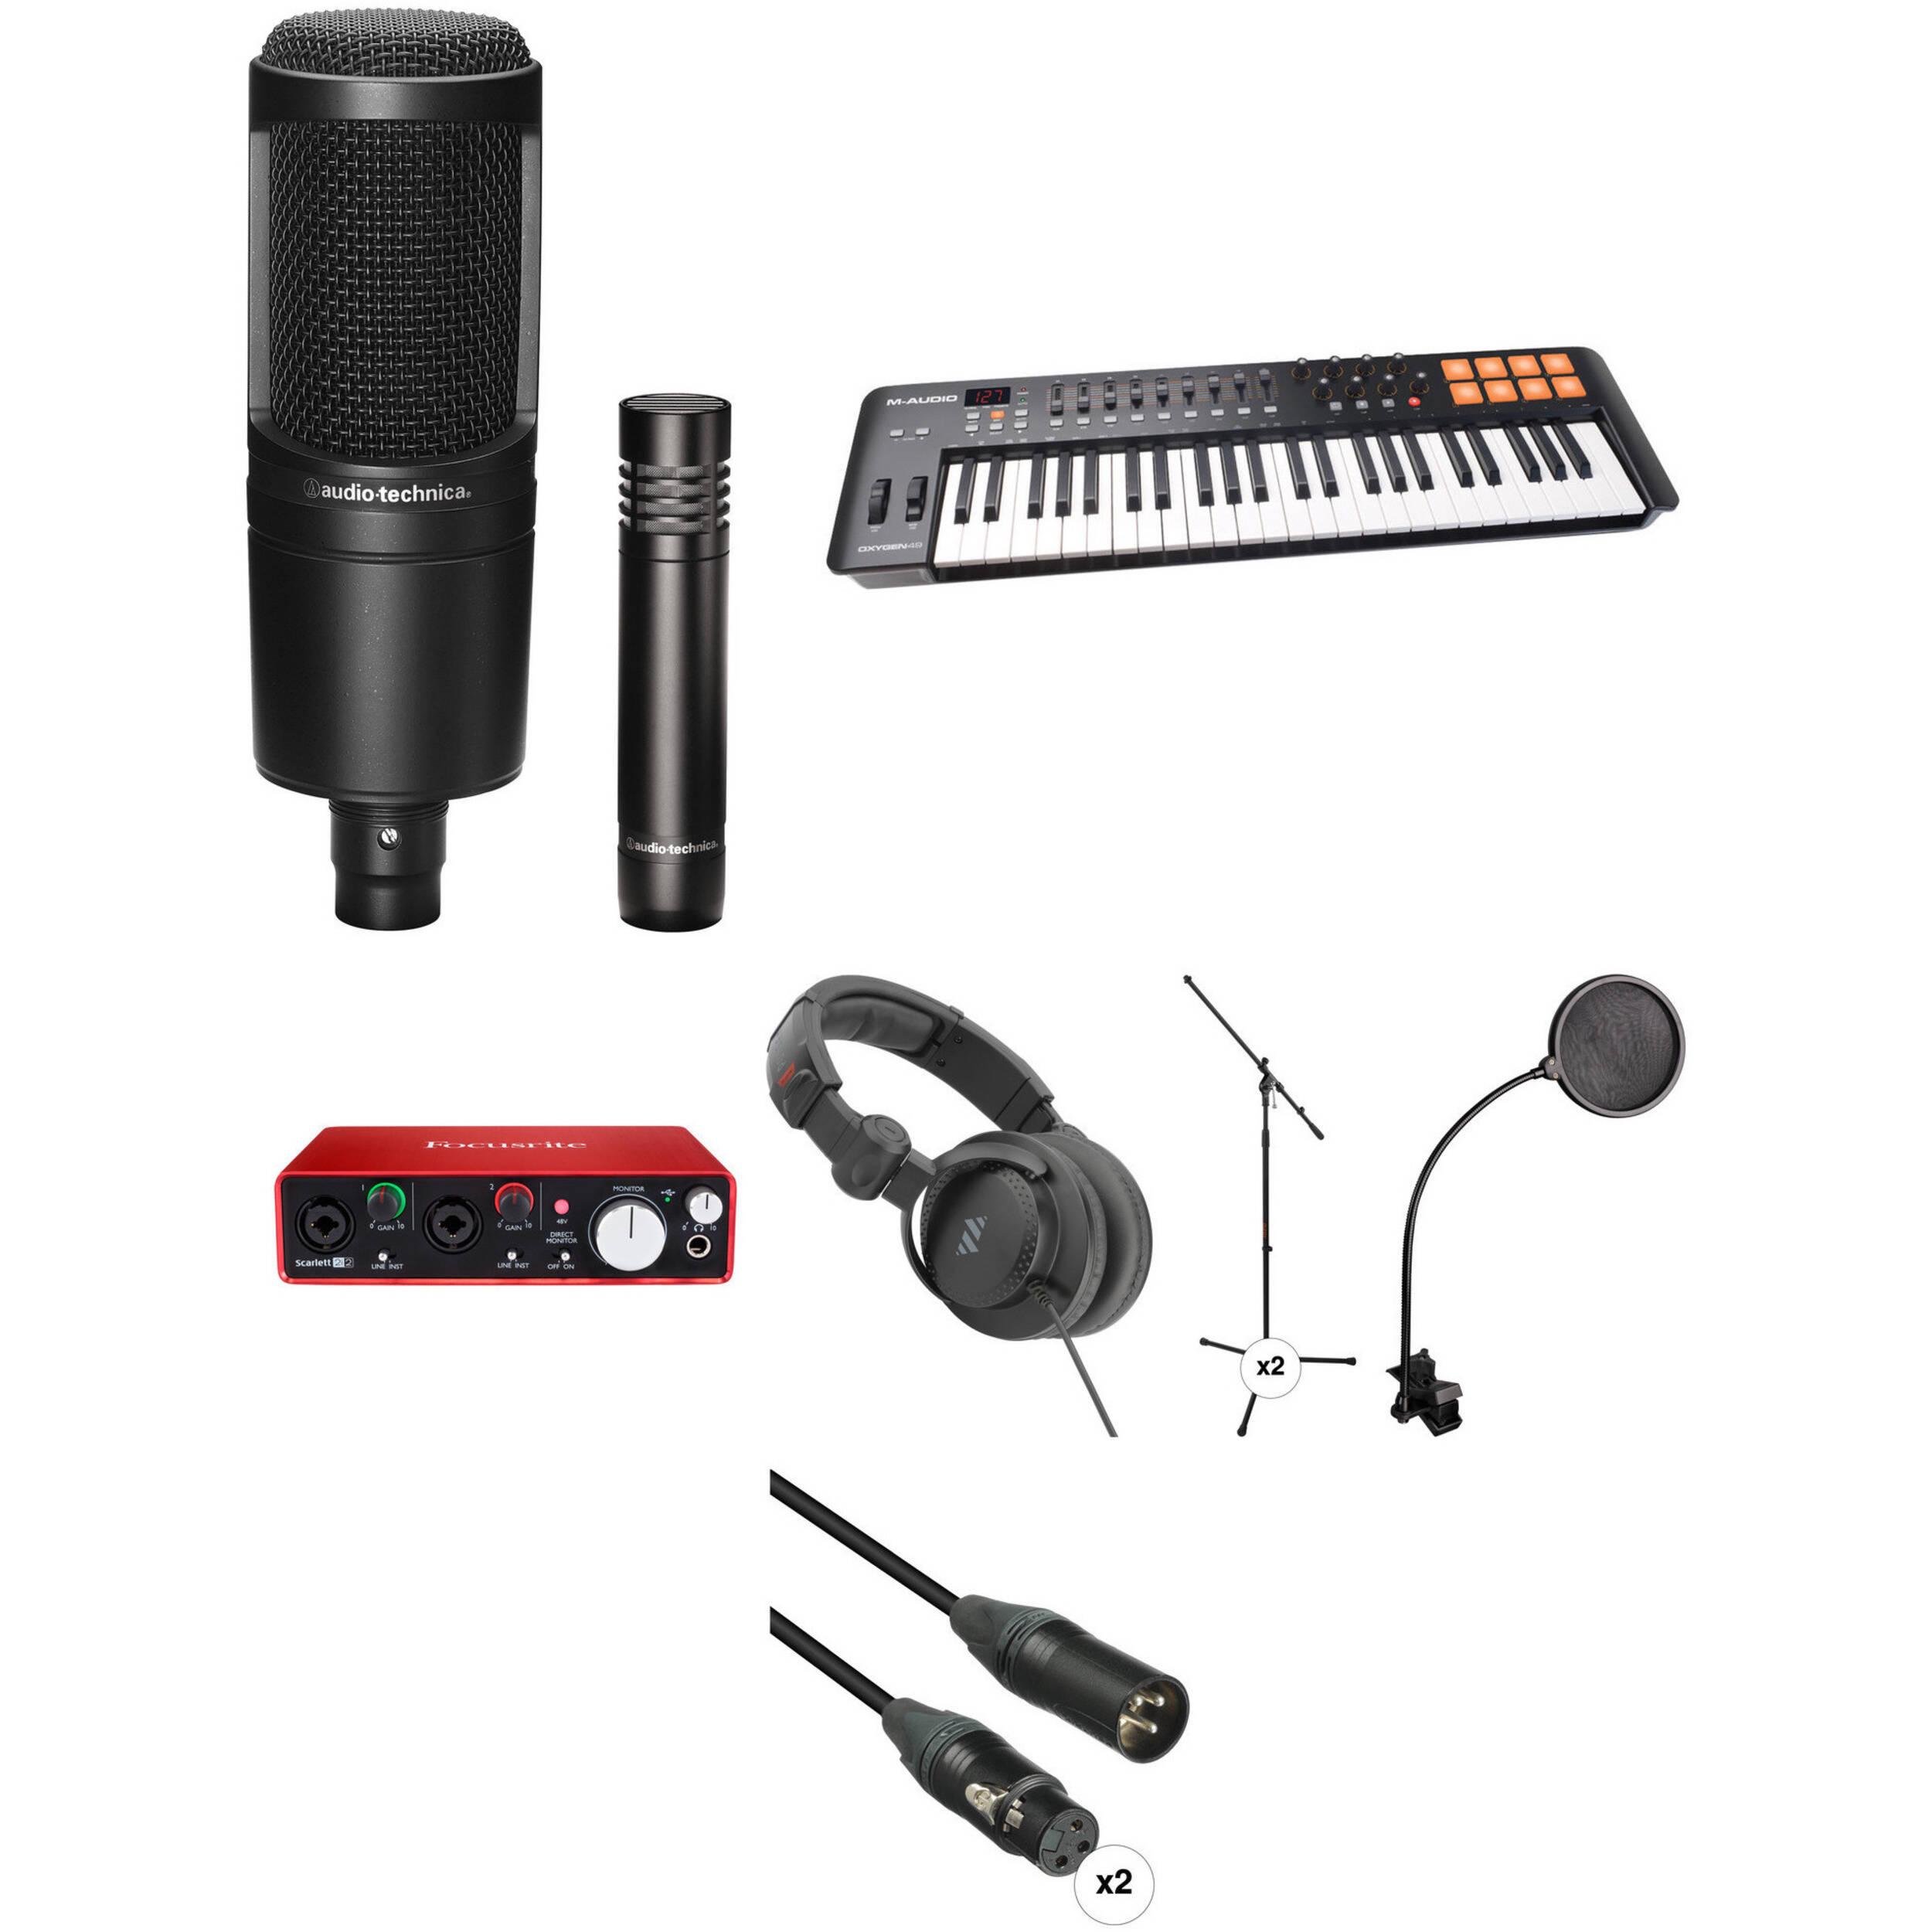 focusrite musician 39 s home recording starter kit b h photo video. Black Bedroom Furniture Sets. Home Design Ideas